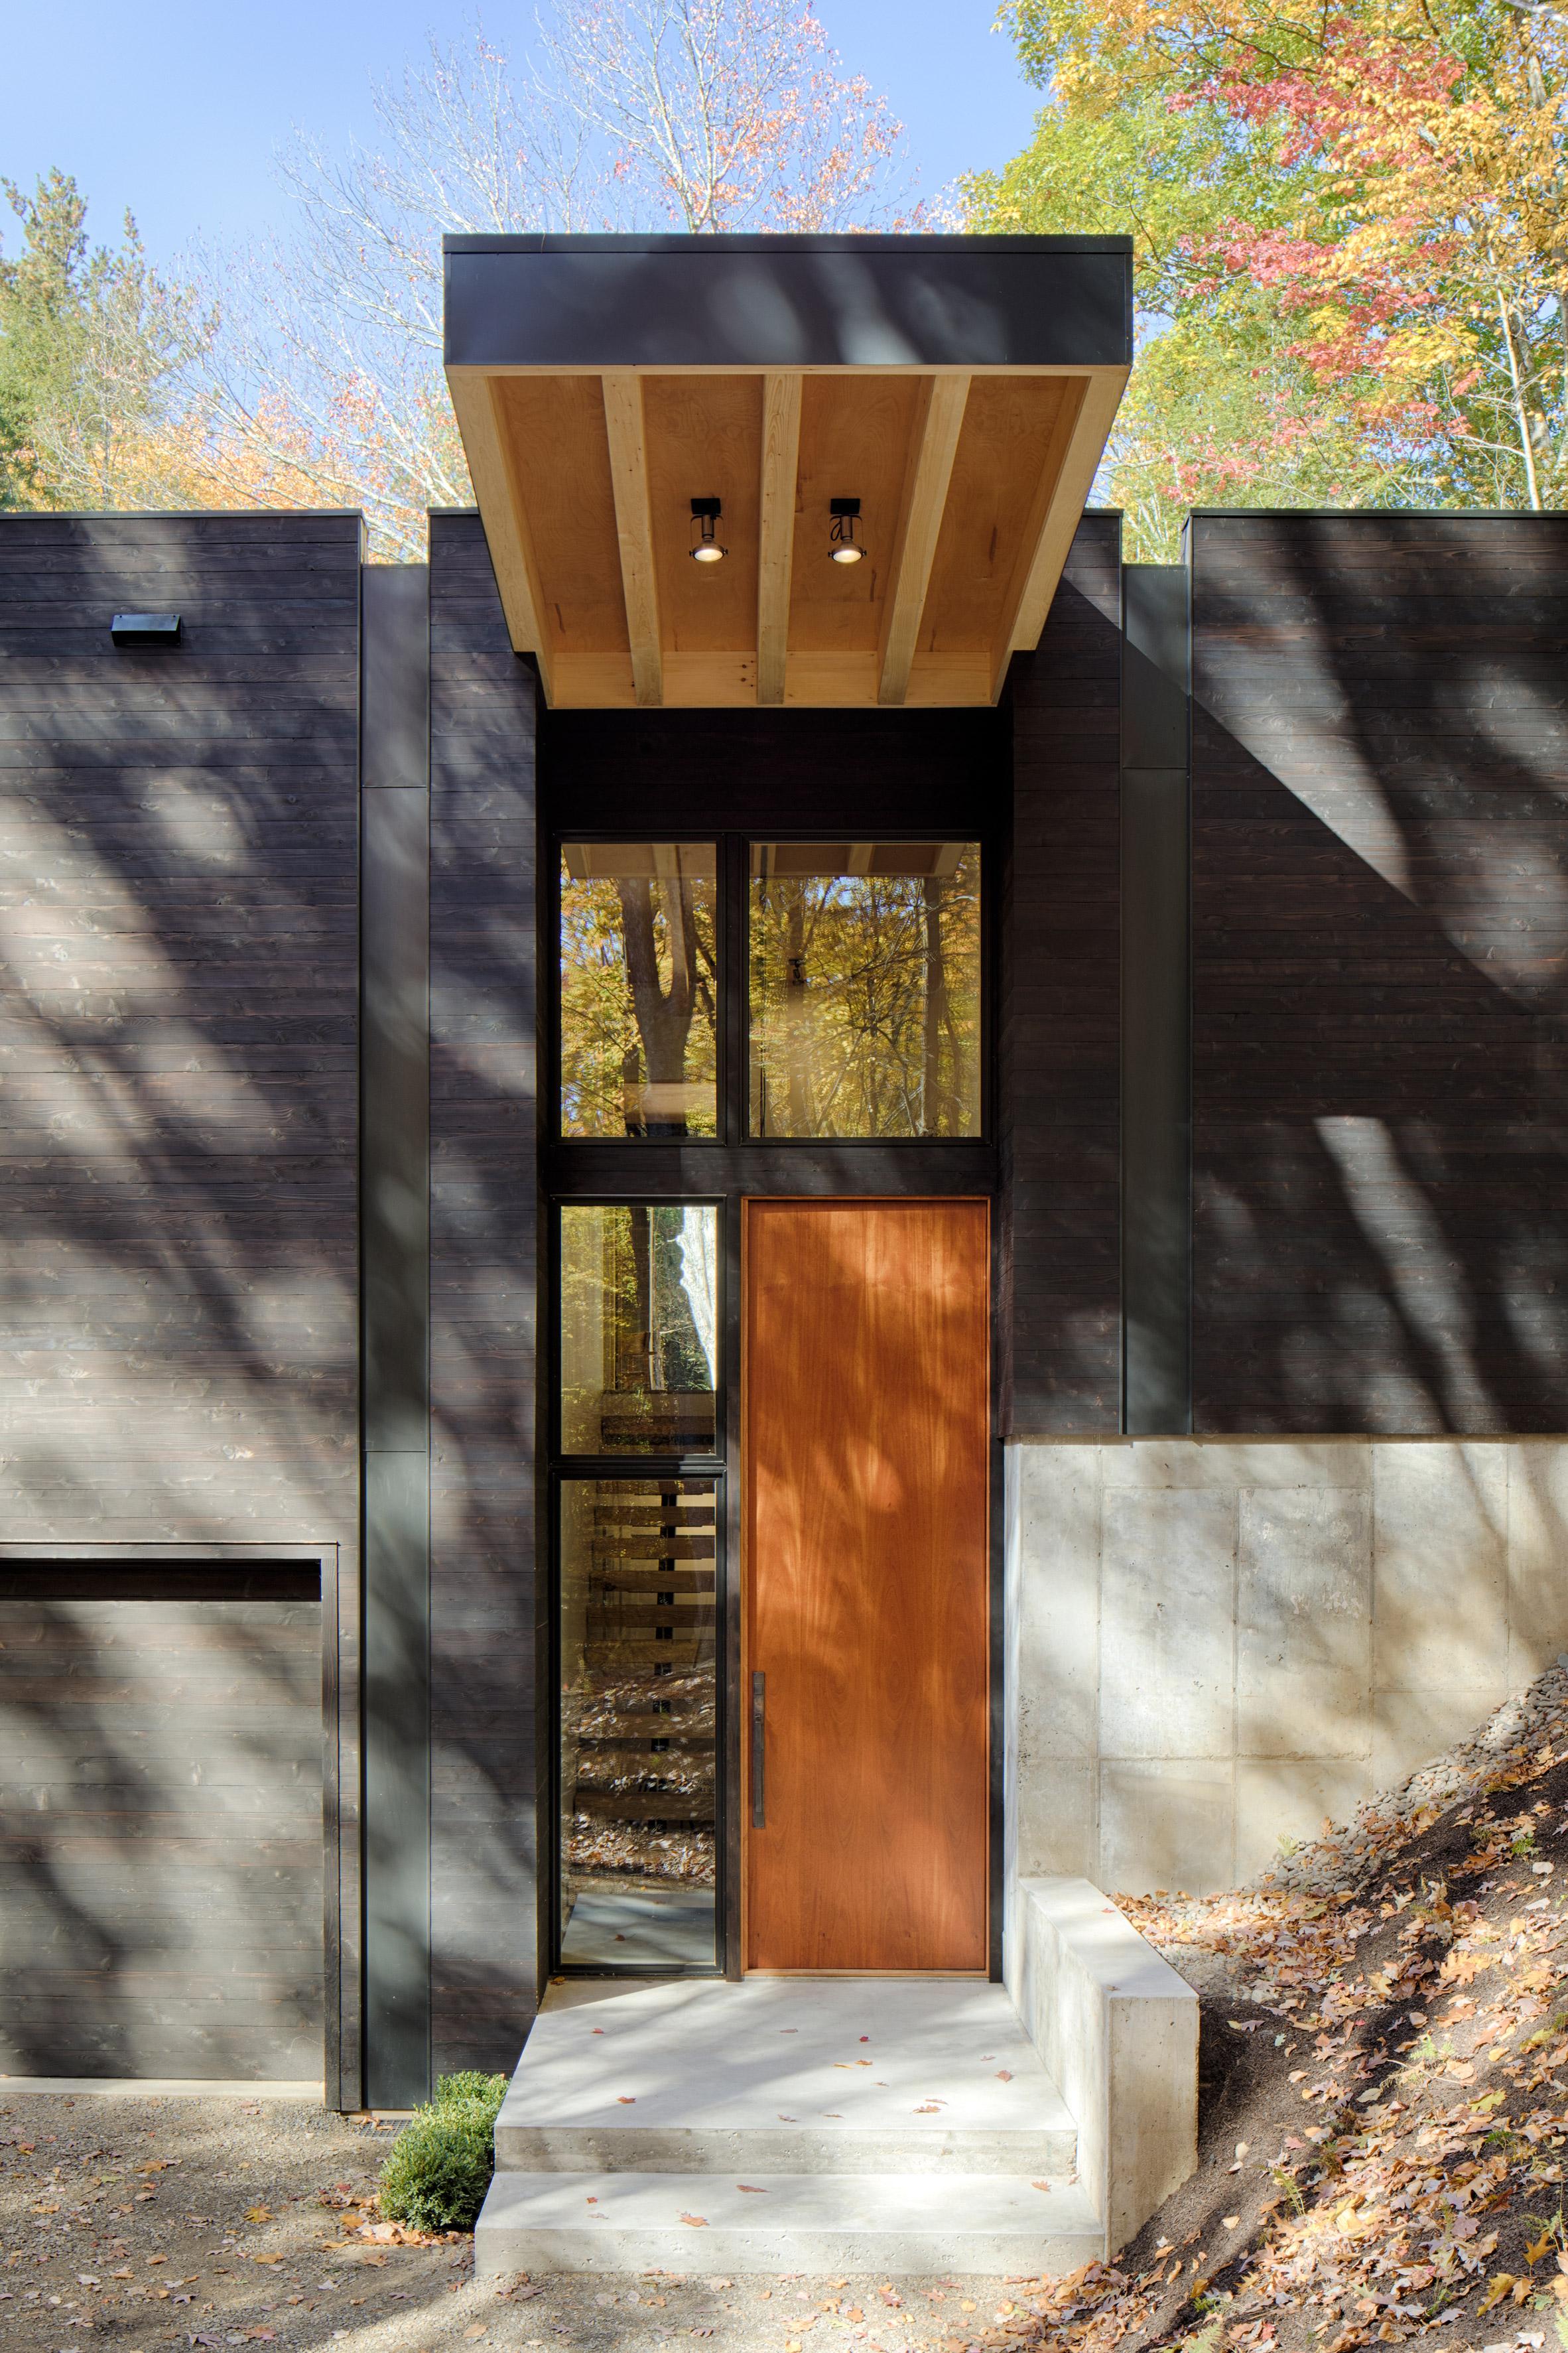 Studio MM clads Hudson Valley hillside cabin in blackened wood